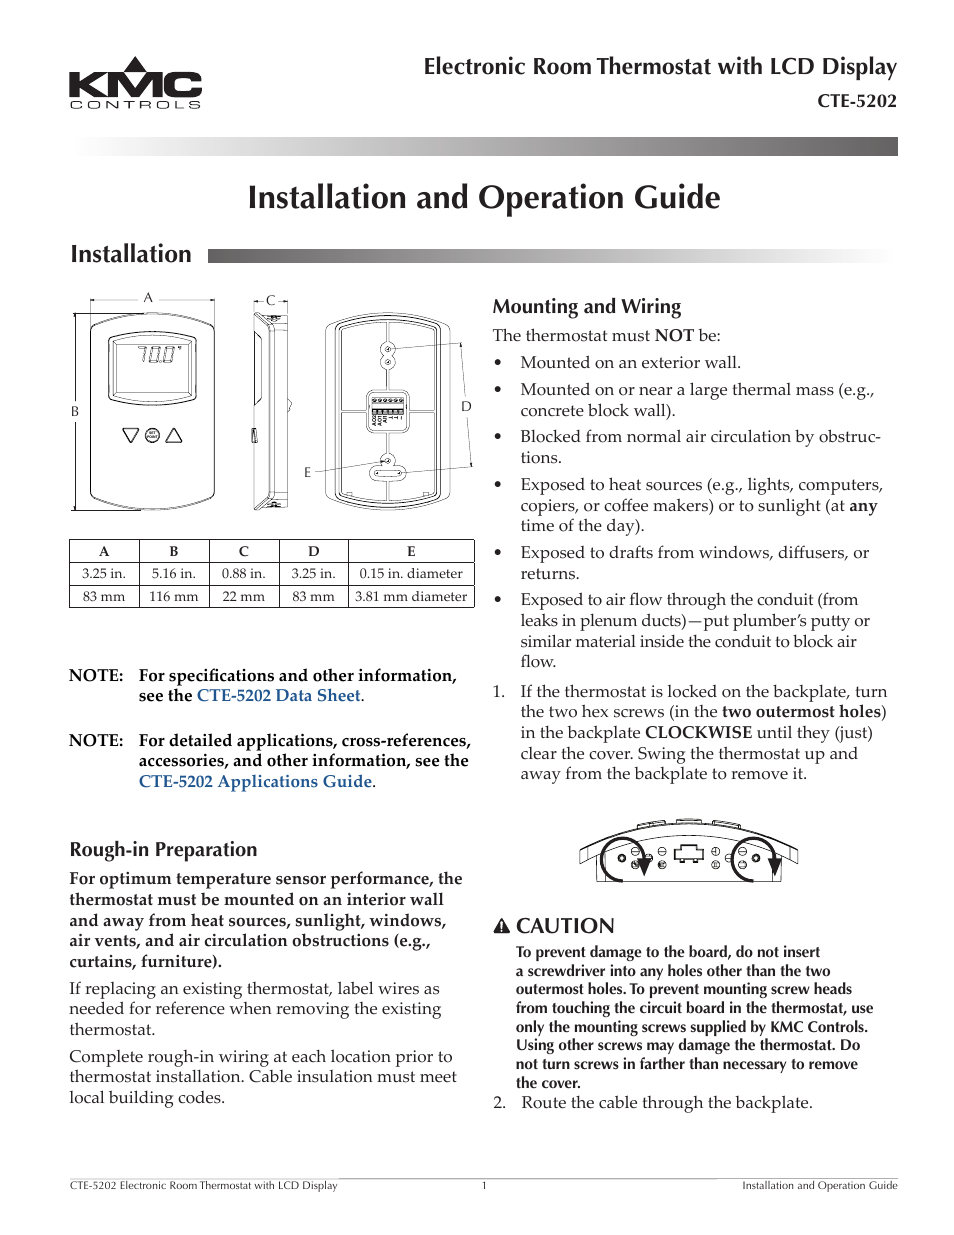 Volume Controls In Manual Guide